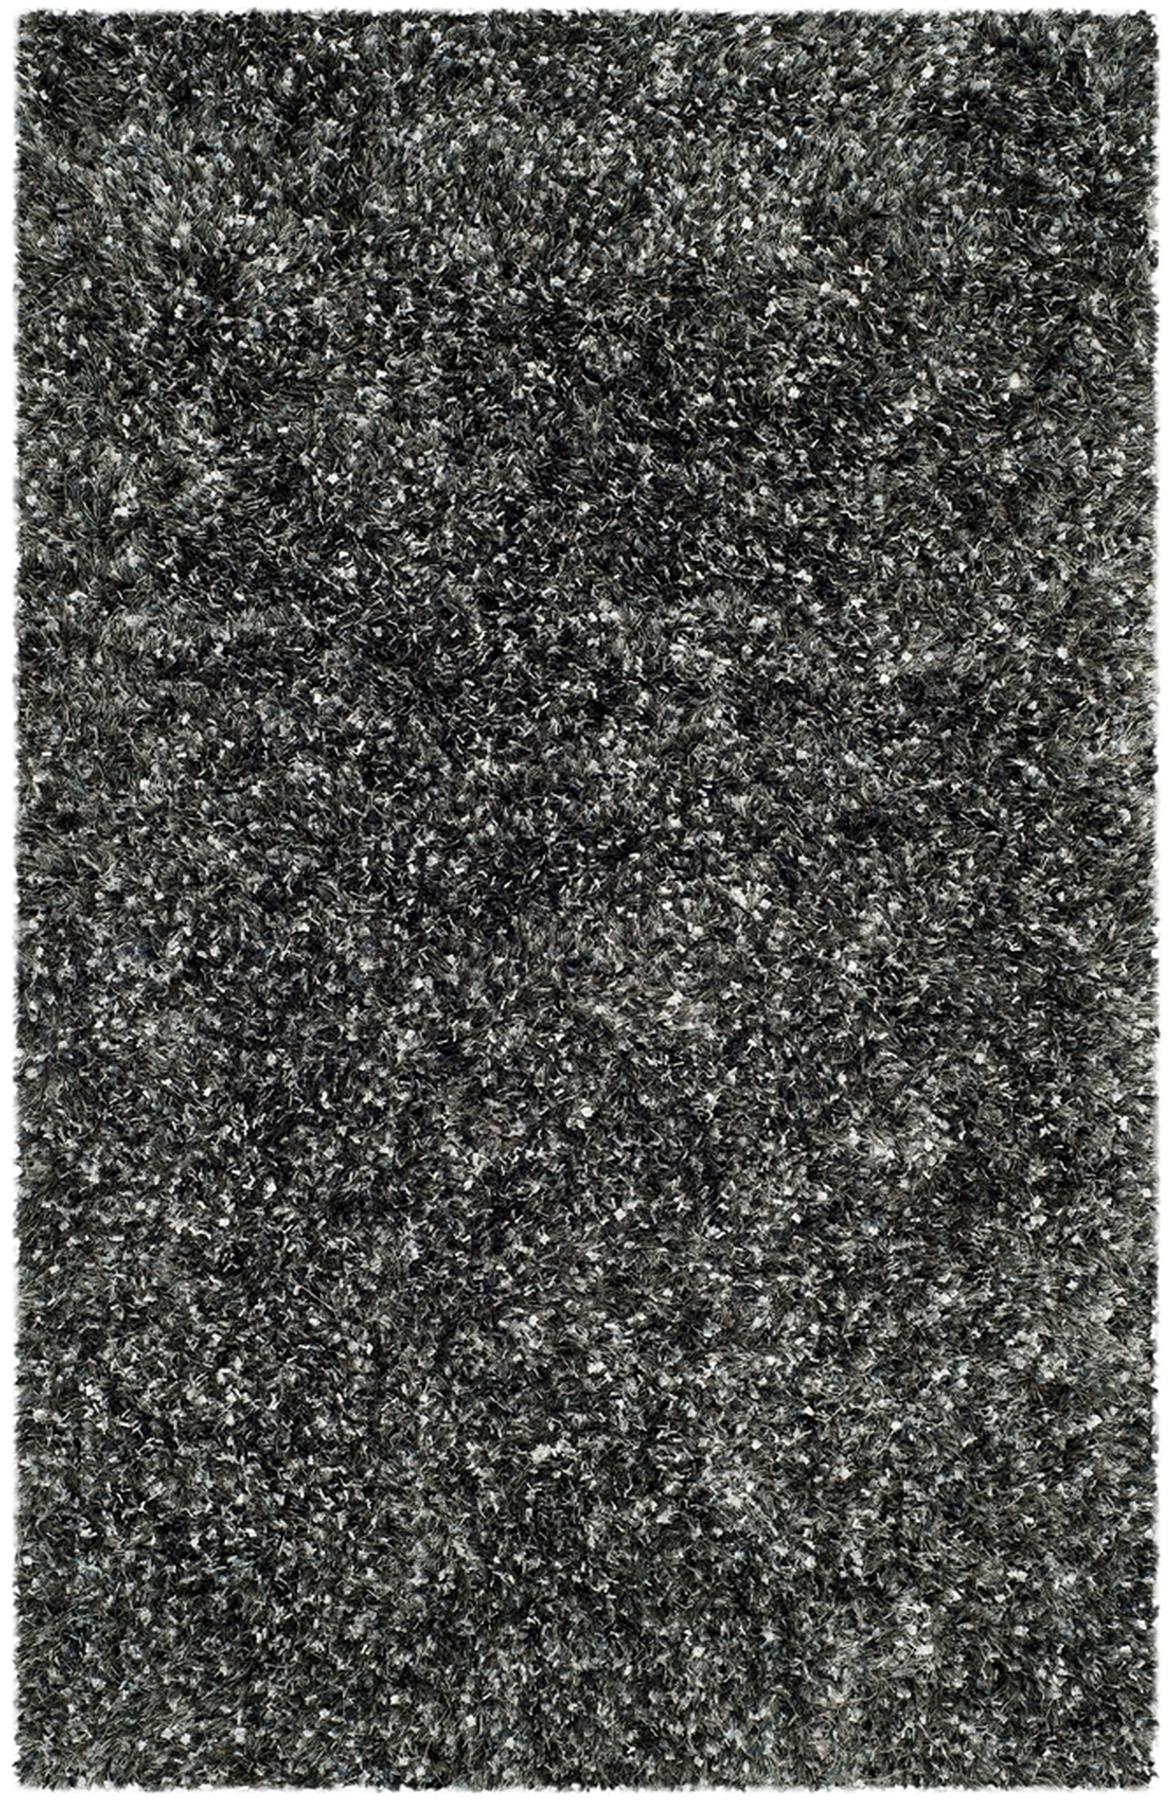 plush charcoal shag rug malibu shag collection safavieh